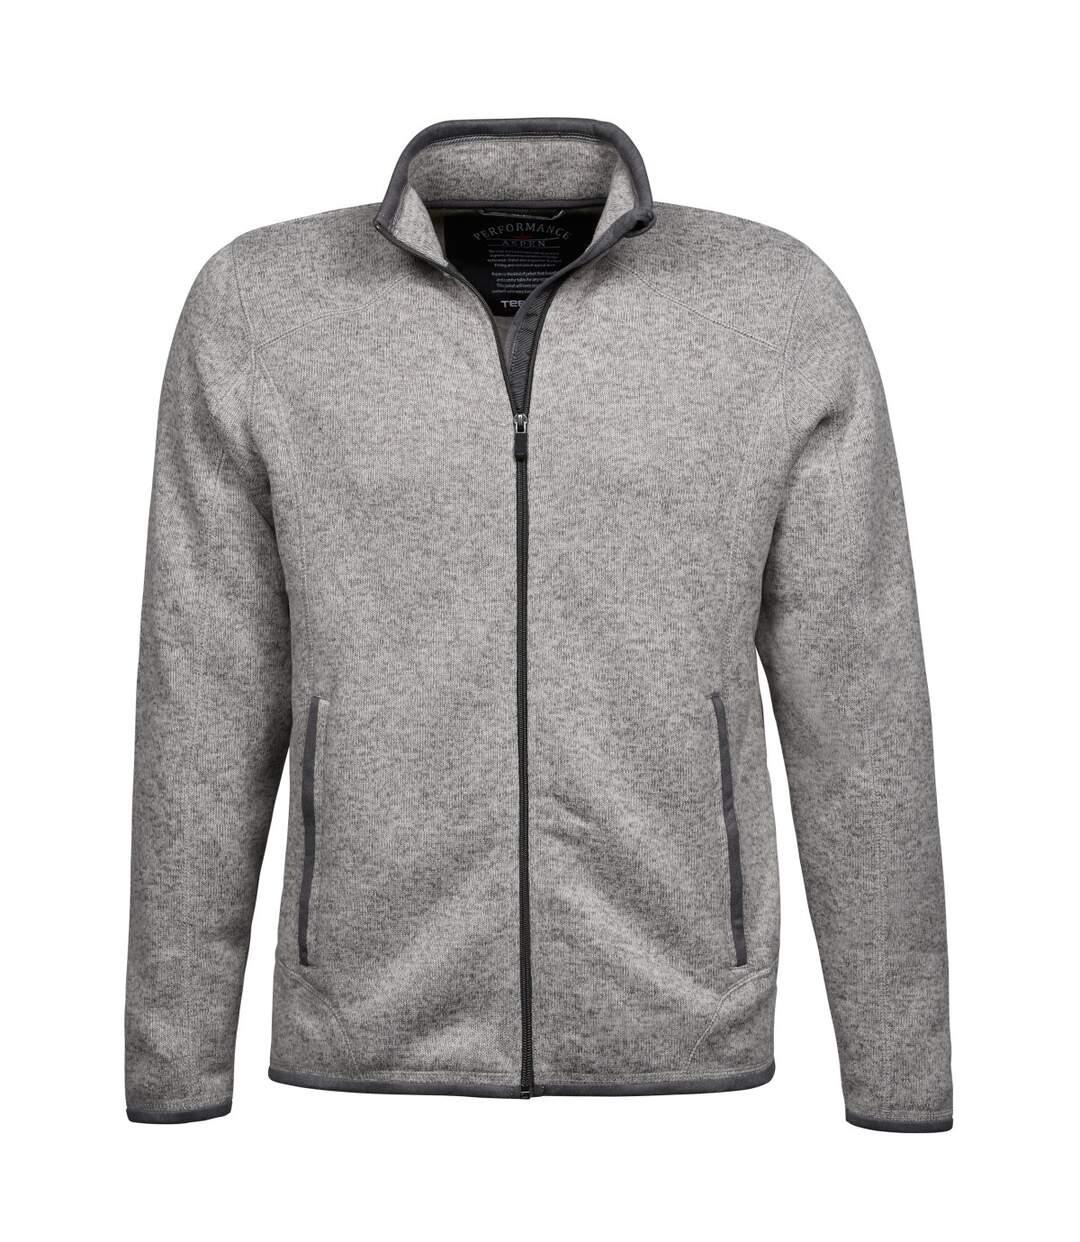 Tee Jays Mens Aspen Full Zip Jacket (Grey Melange) - UTBC3332